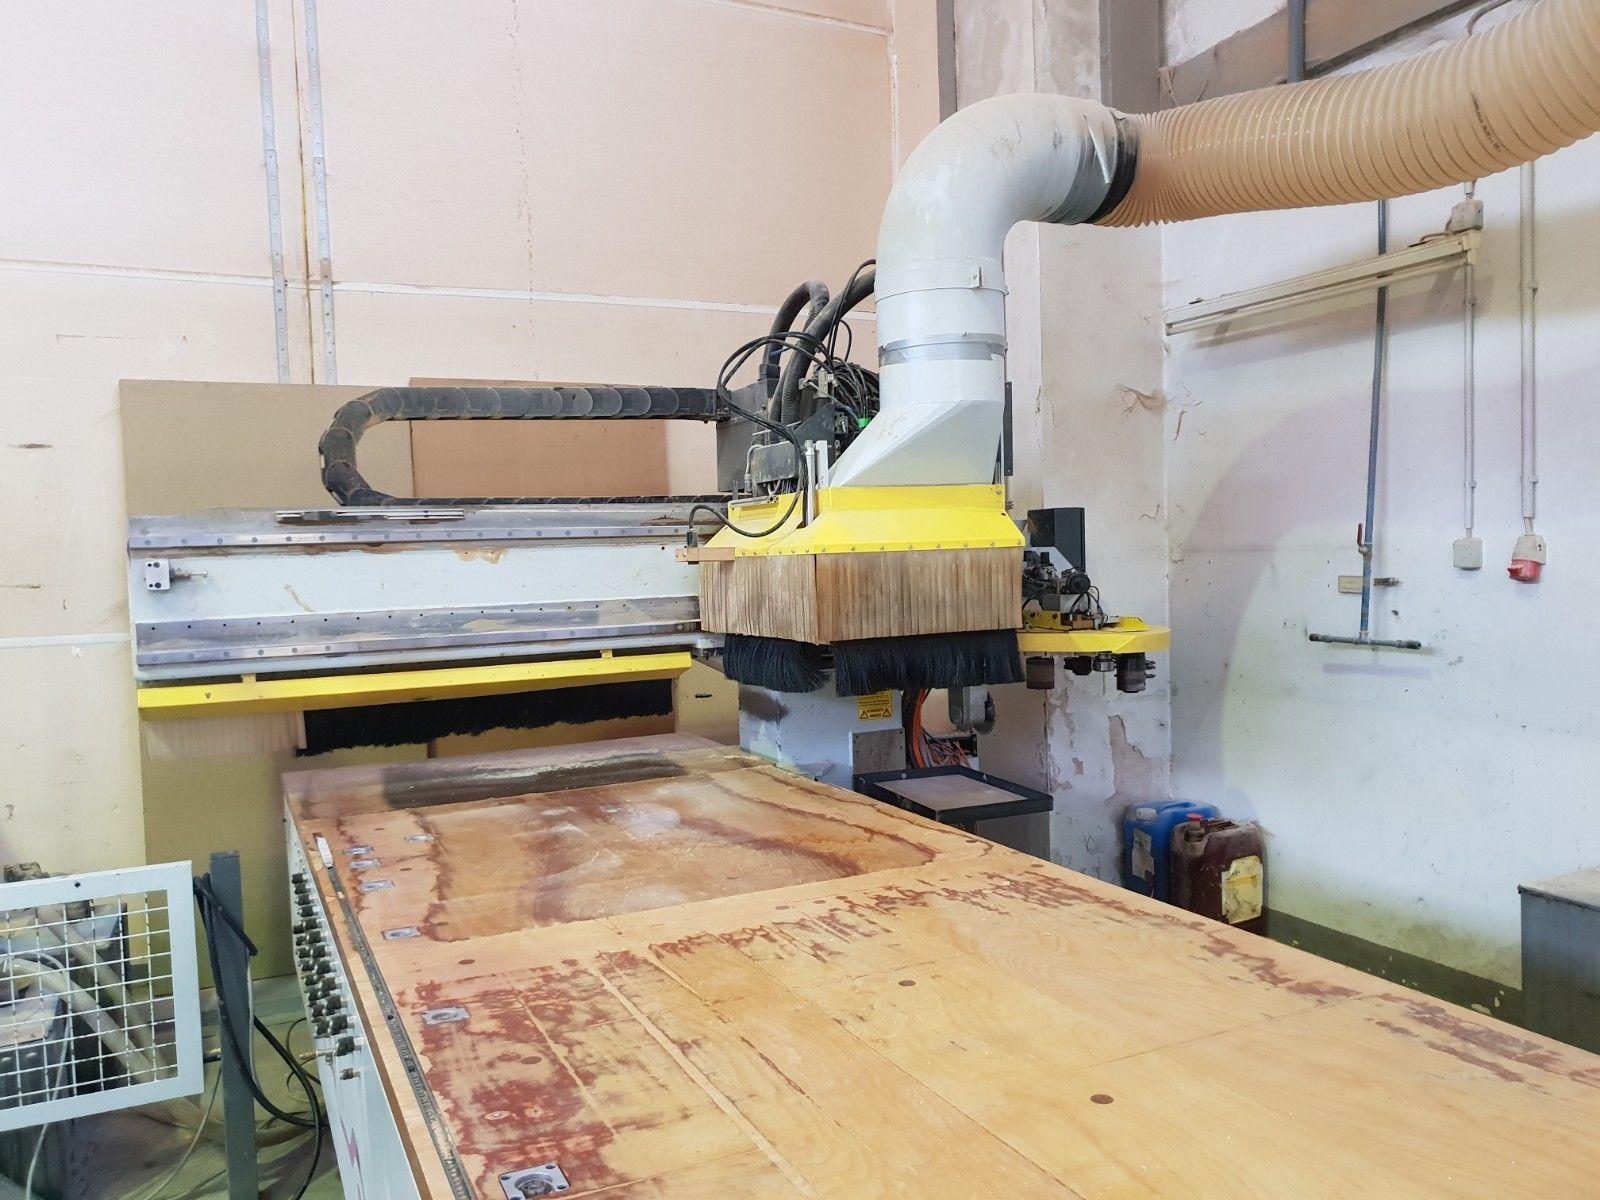 HOMAG BOF 31 CNC Holzbearbeitungszentrum, VOLL FUNKTIONSFÄHIG -Glatttisch-